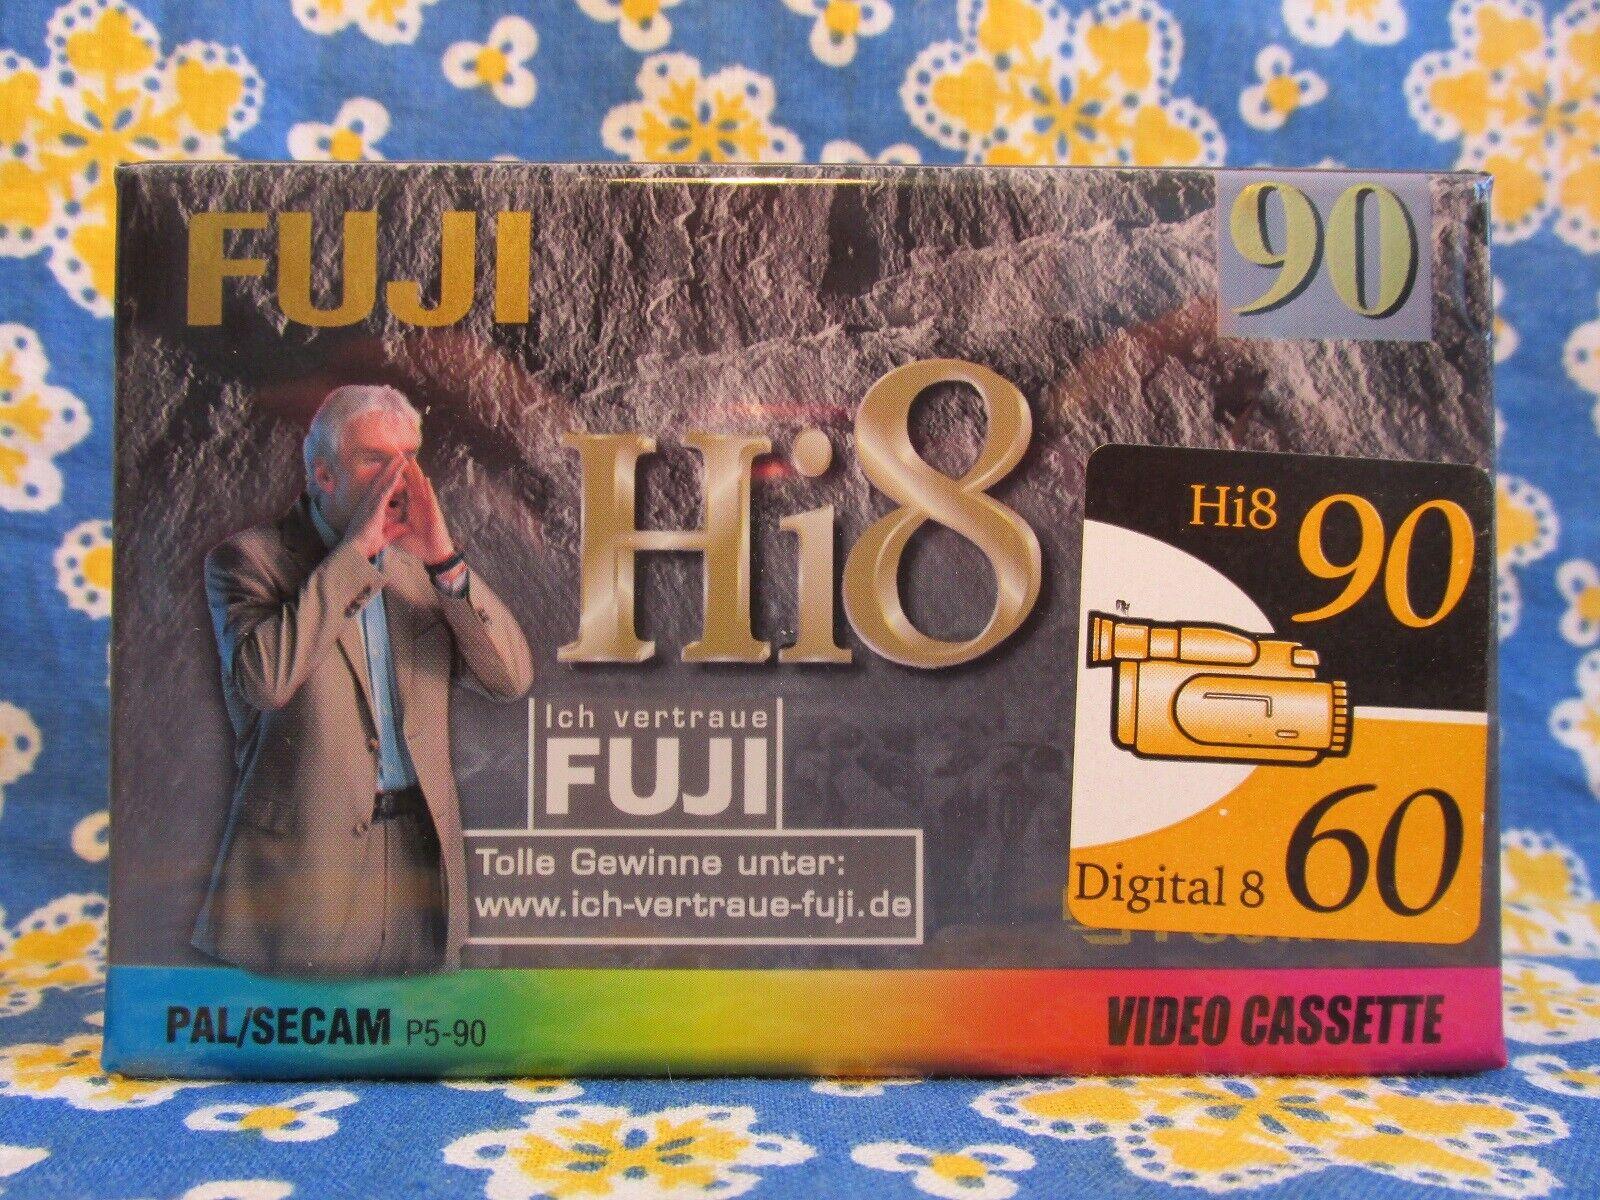 Fuji 90 Hi8 PAL SECAM Digital 60 PAL SECAM Video Cassette OVP